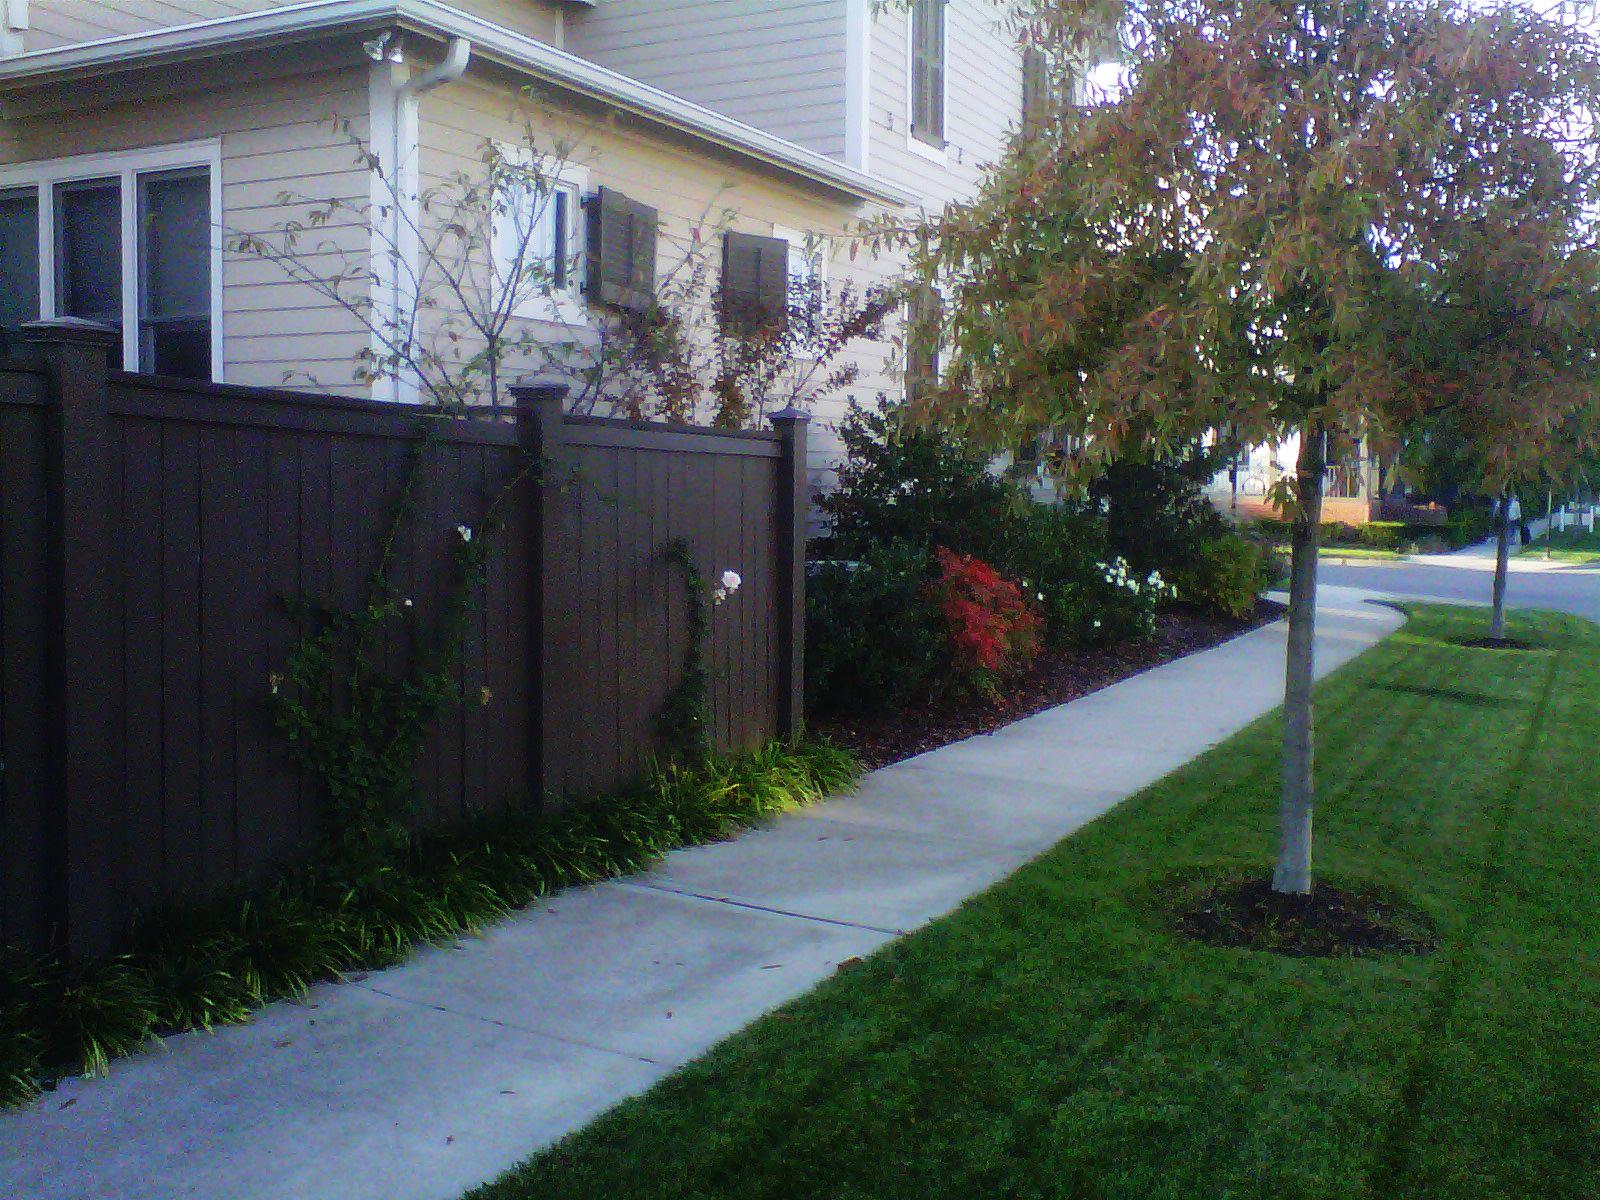 Justin Stelter Landscape Gardening - Modern Suburban Landscaping - 12592069714_b4f52563d6_o.jpg